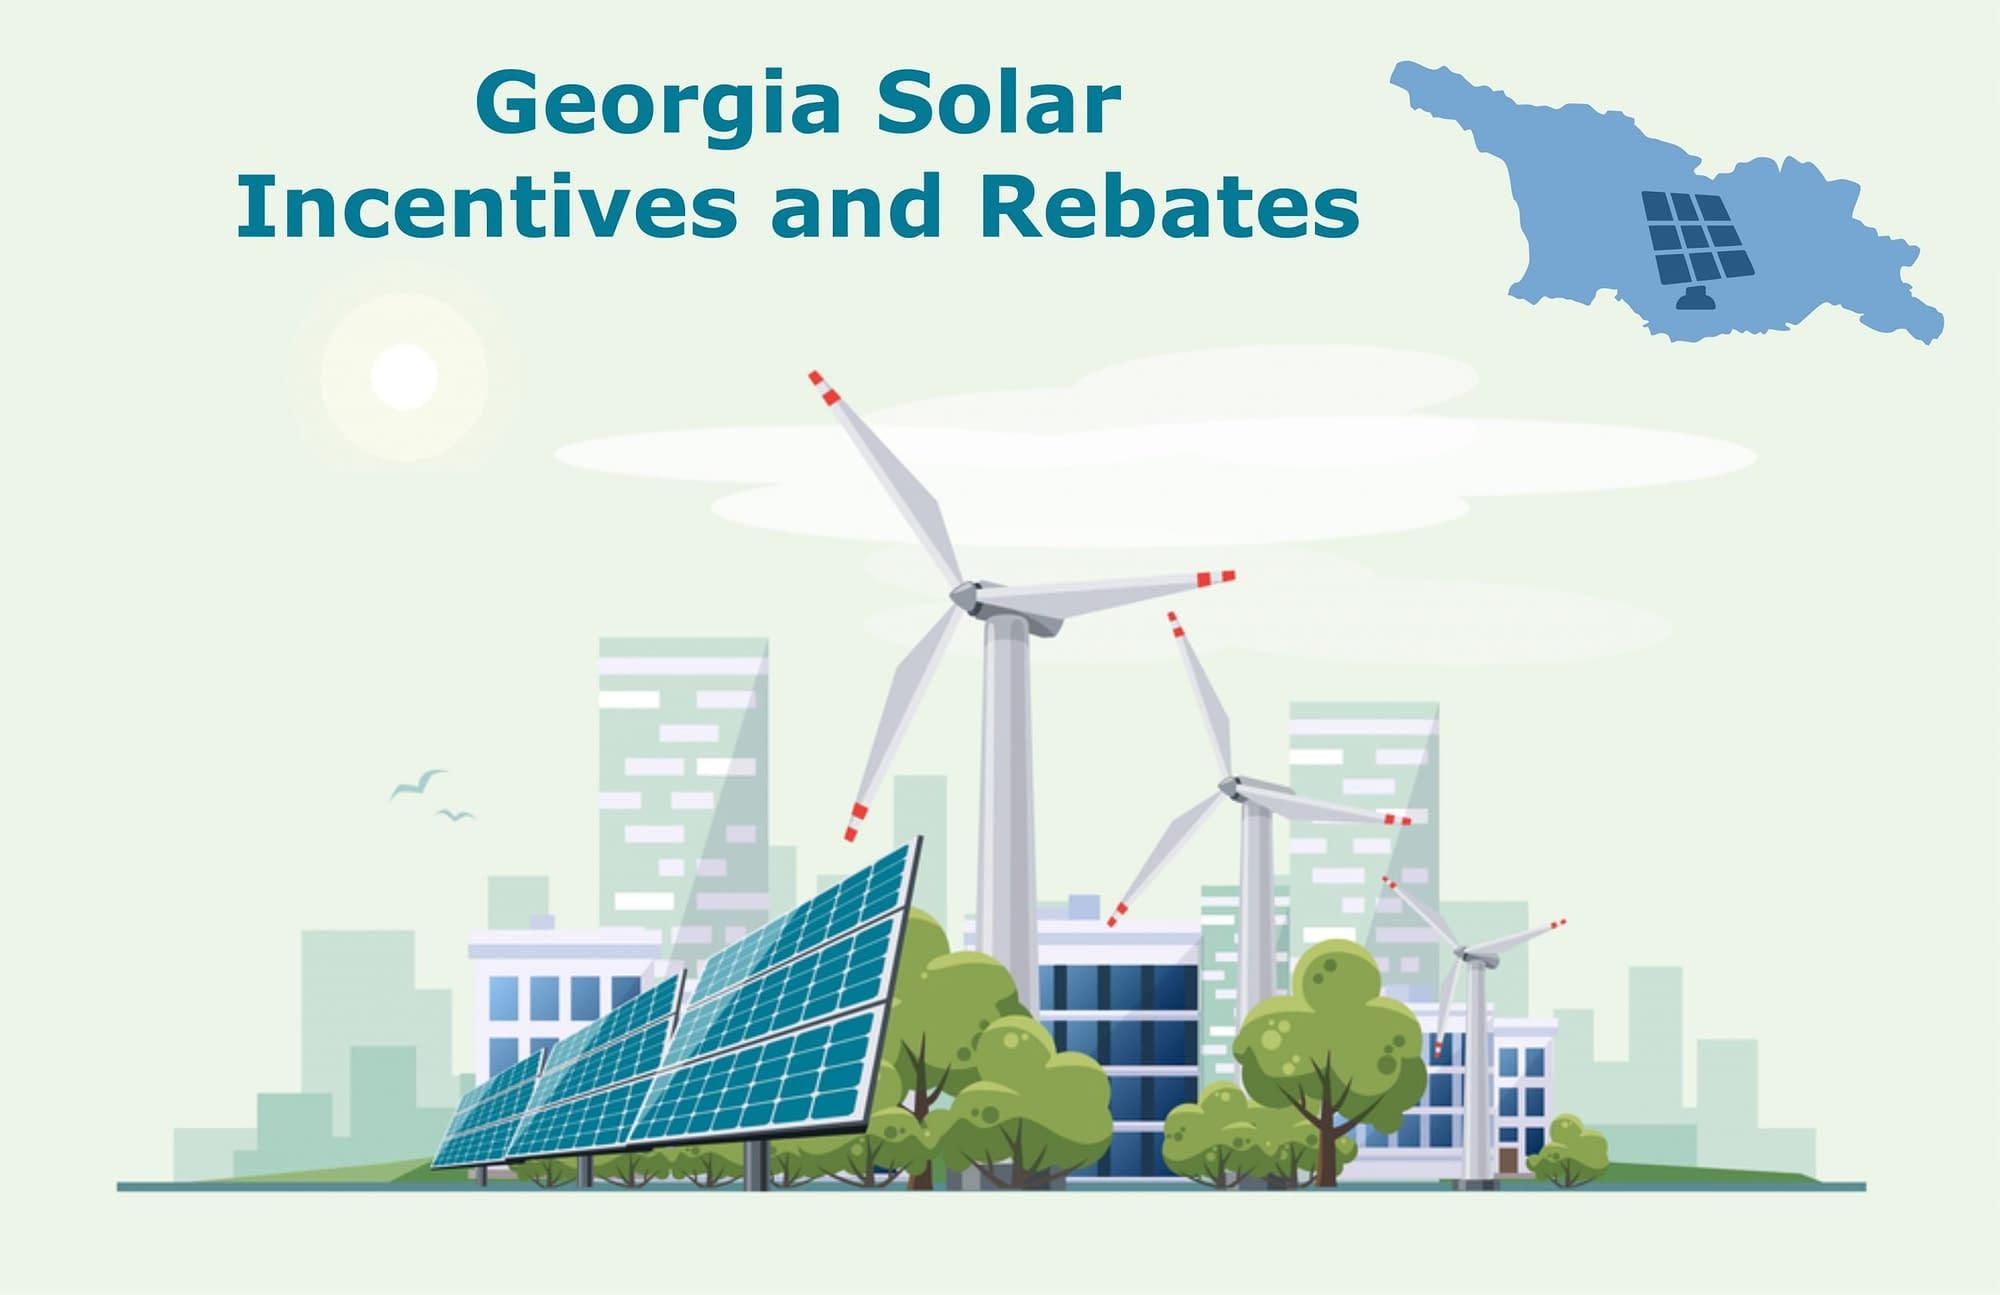 Georgia Solar Incentives and Rebates